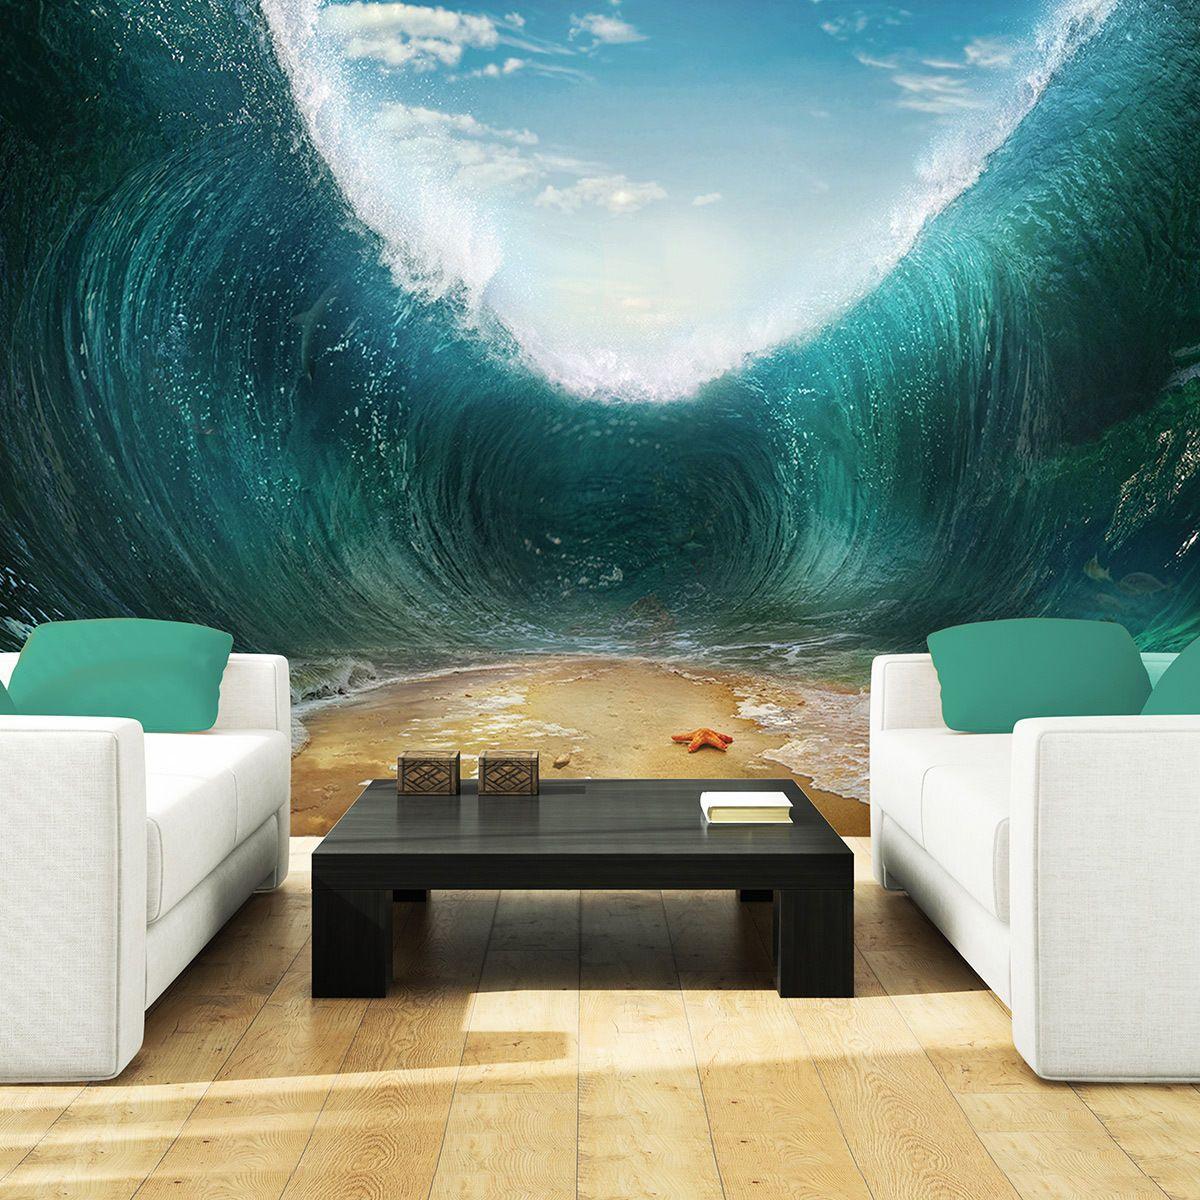 Foto Poster Wandbild Tapeten Fototapete Wasser Meer Natur